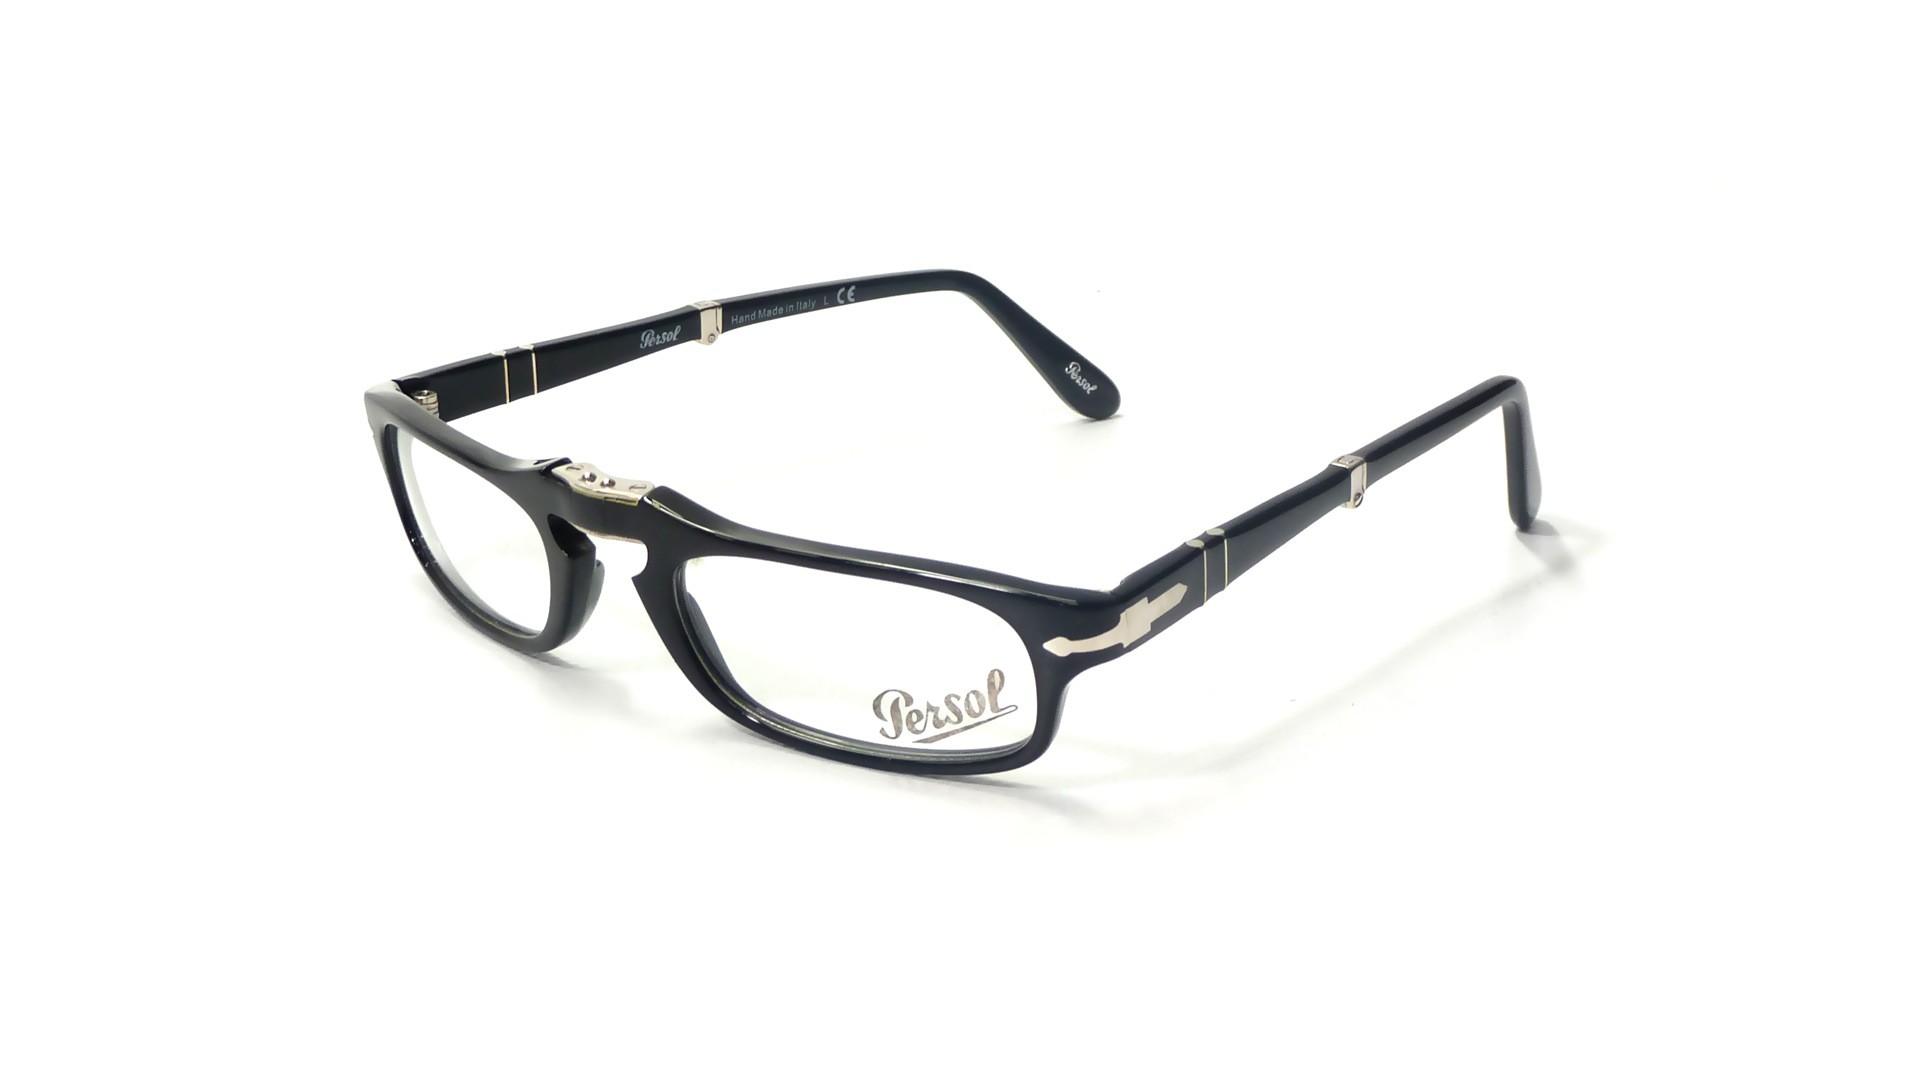 7a04dfb776 Eyeglasses Persol PO2886V 95 51-22 Black Medium Folding